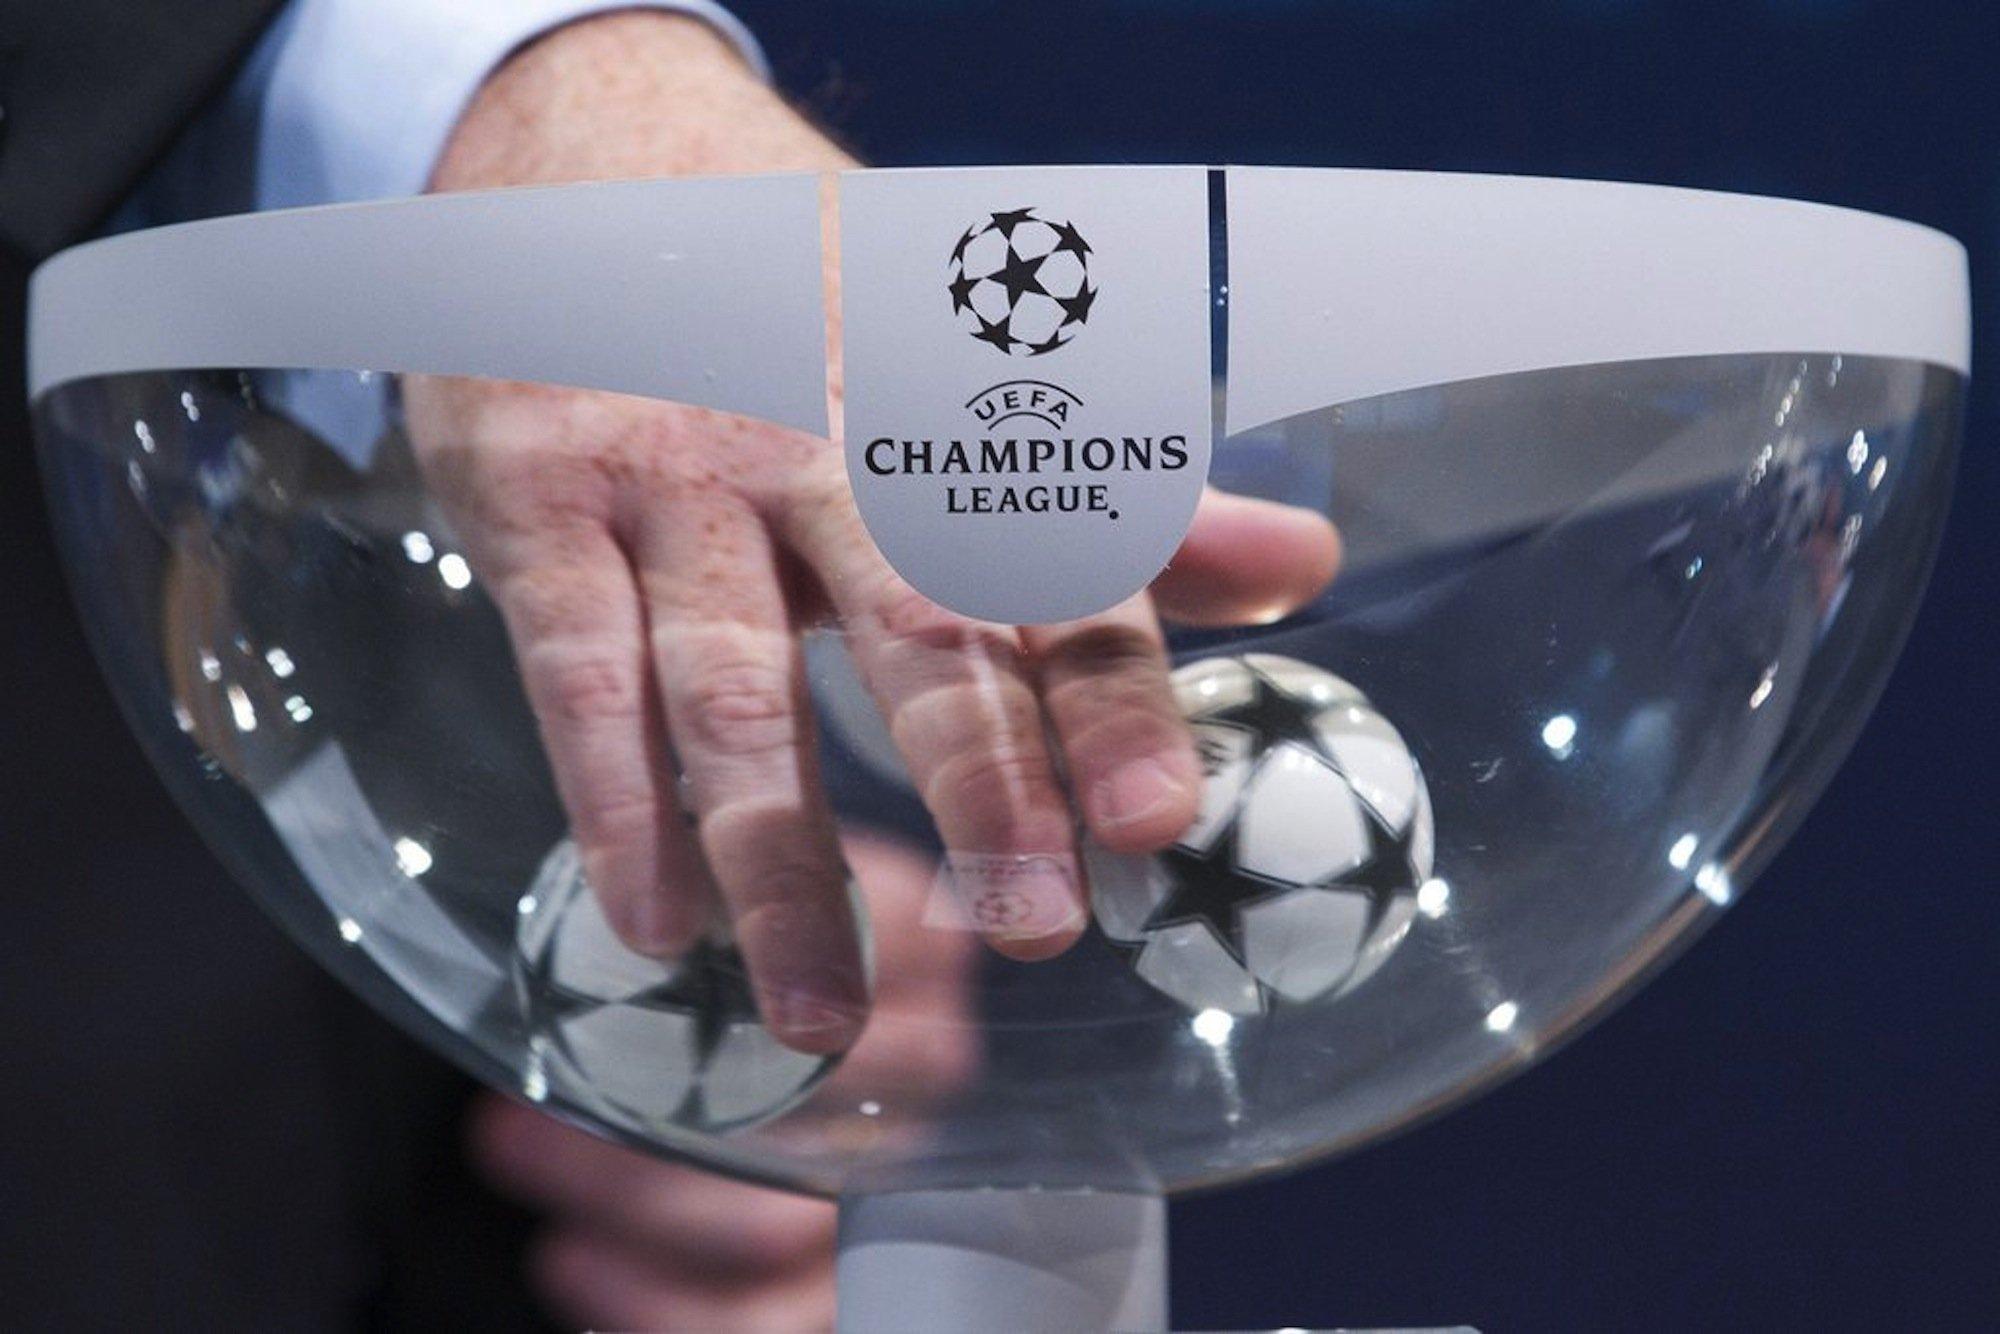 Sorteggi Champions League, i gironi delle italiane